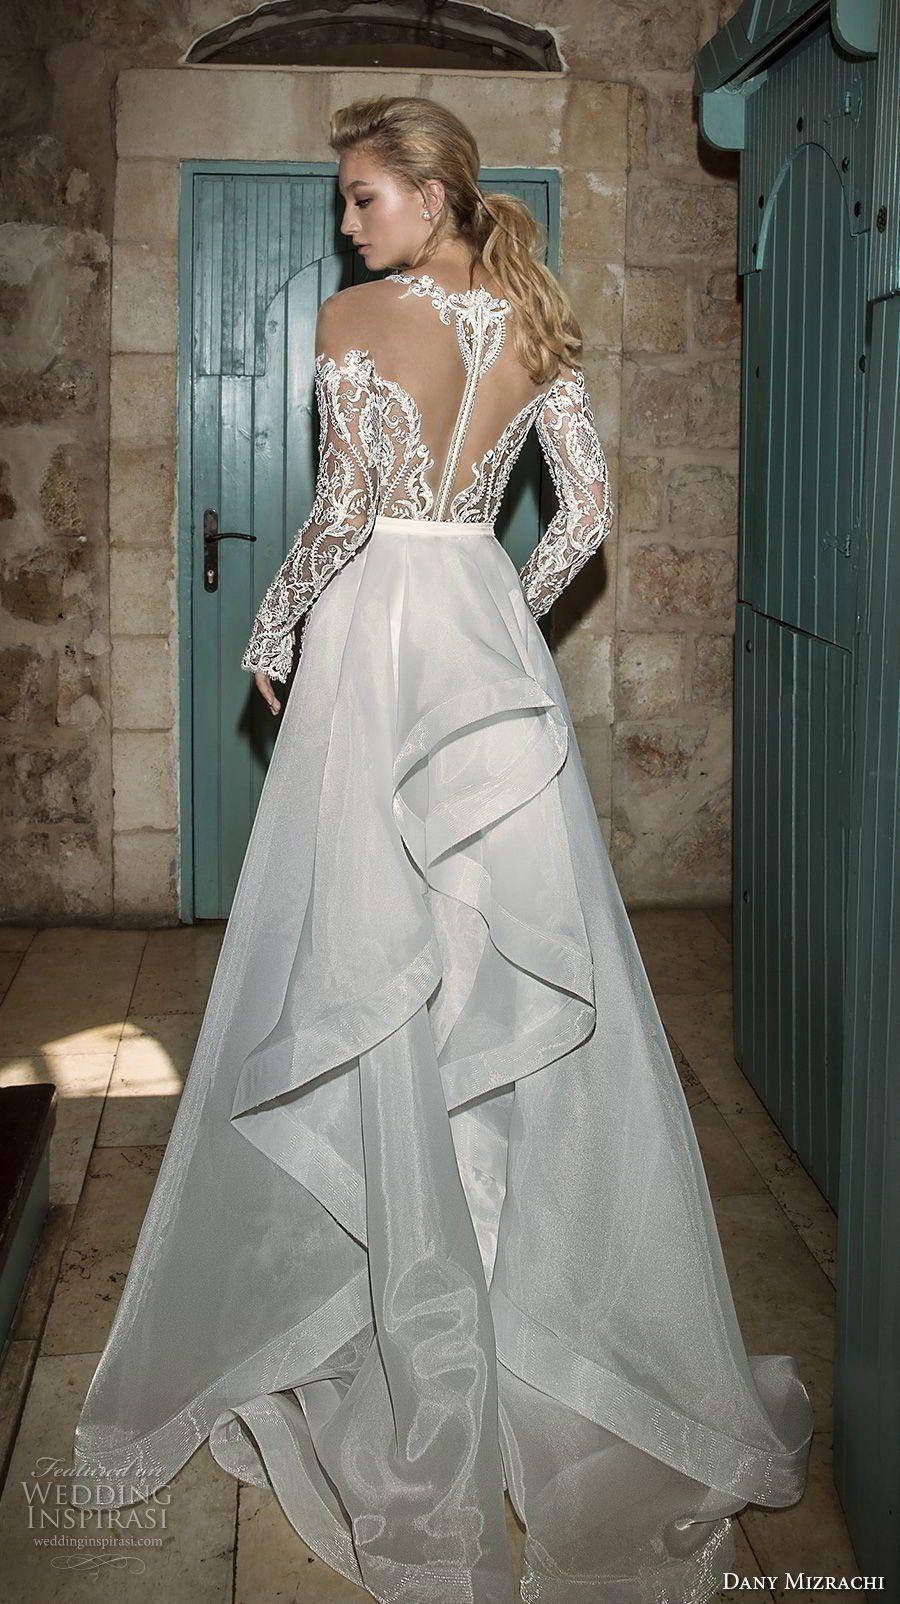 Dany mizrachi spring bridal long sleeves off the shoulder deep